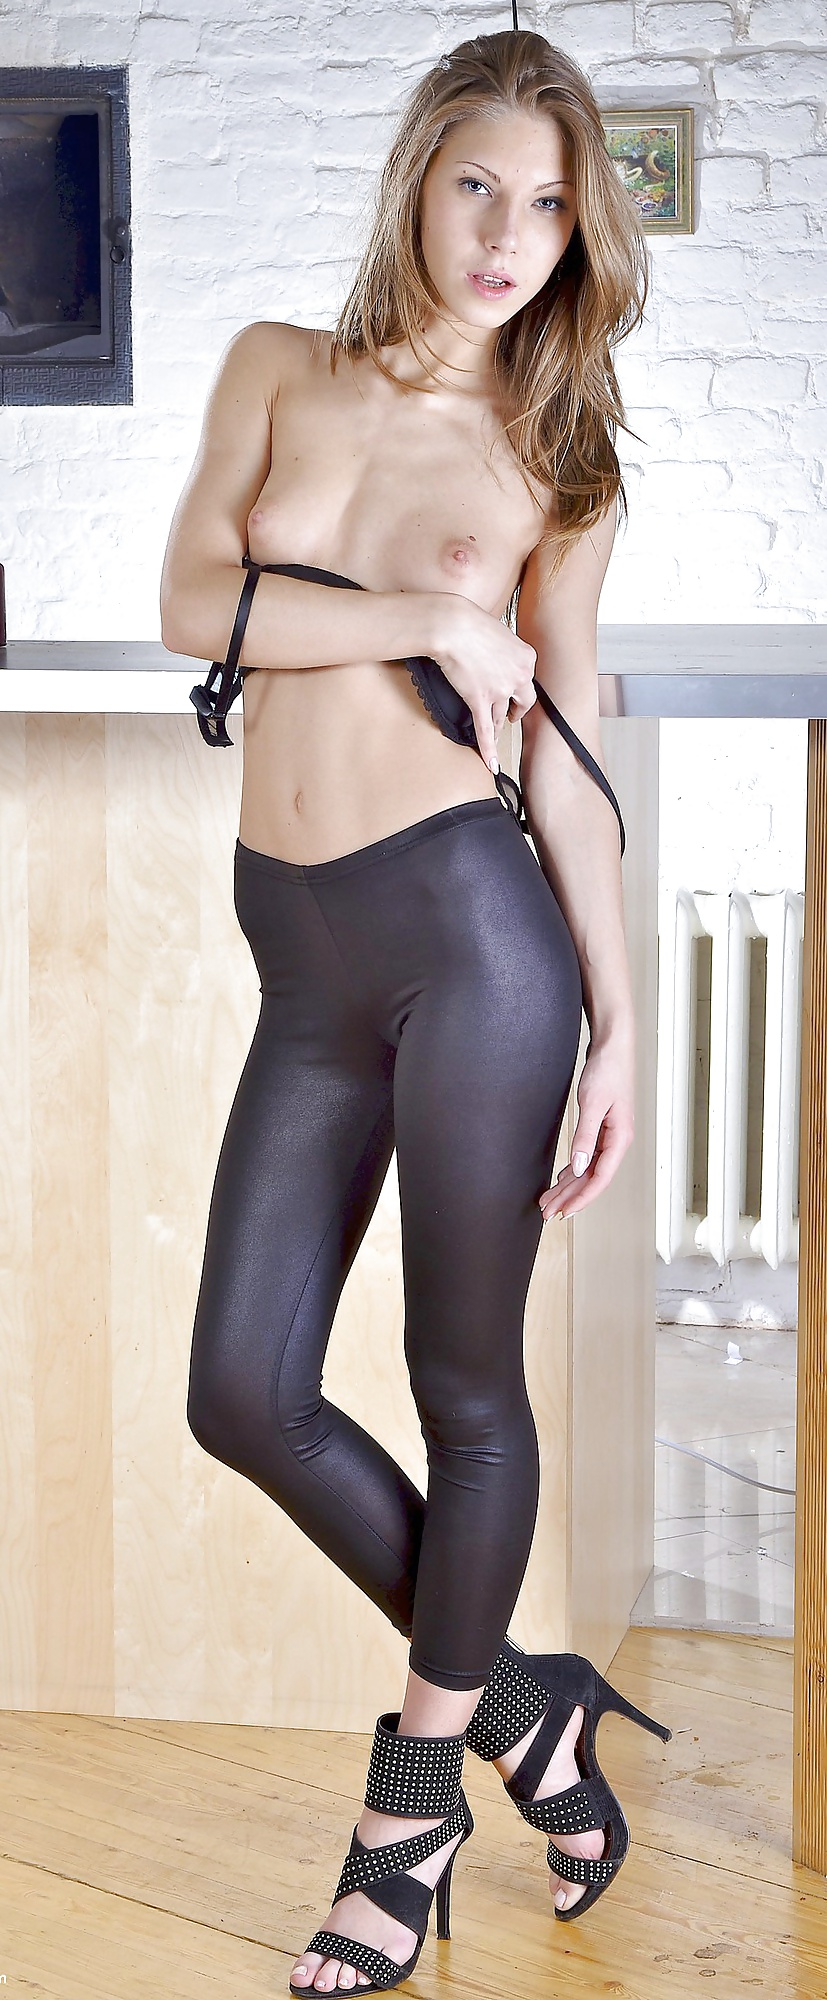 Young babe sexy leggings, sasha alexander nude gif